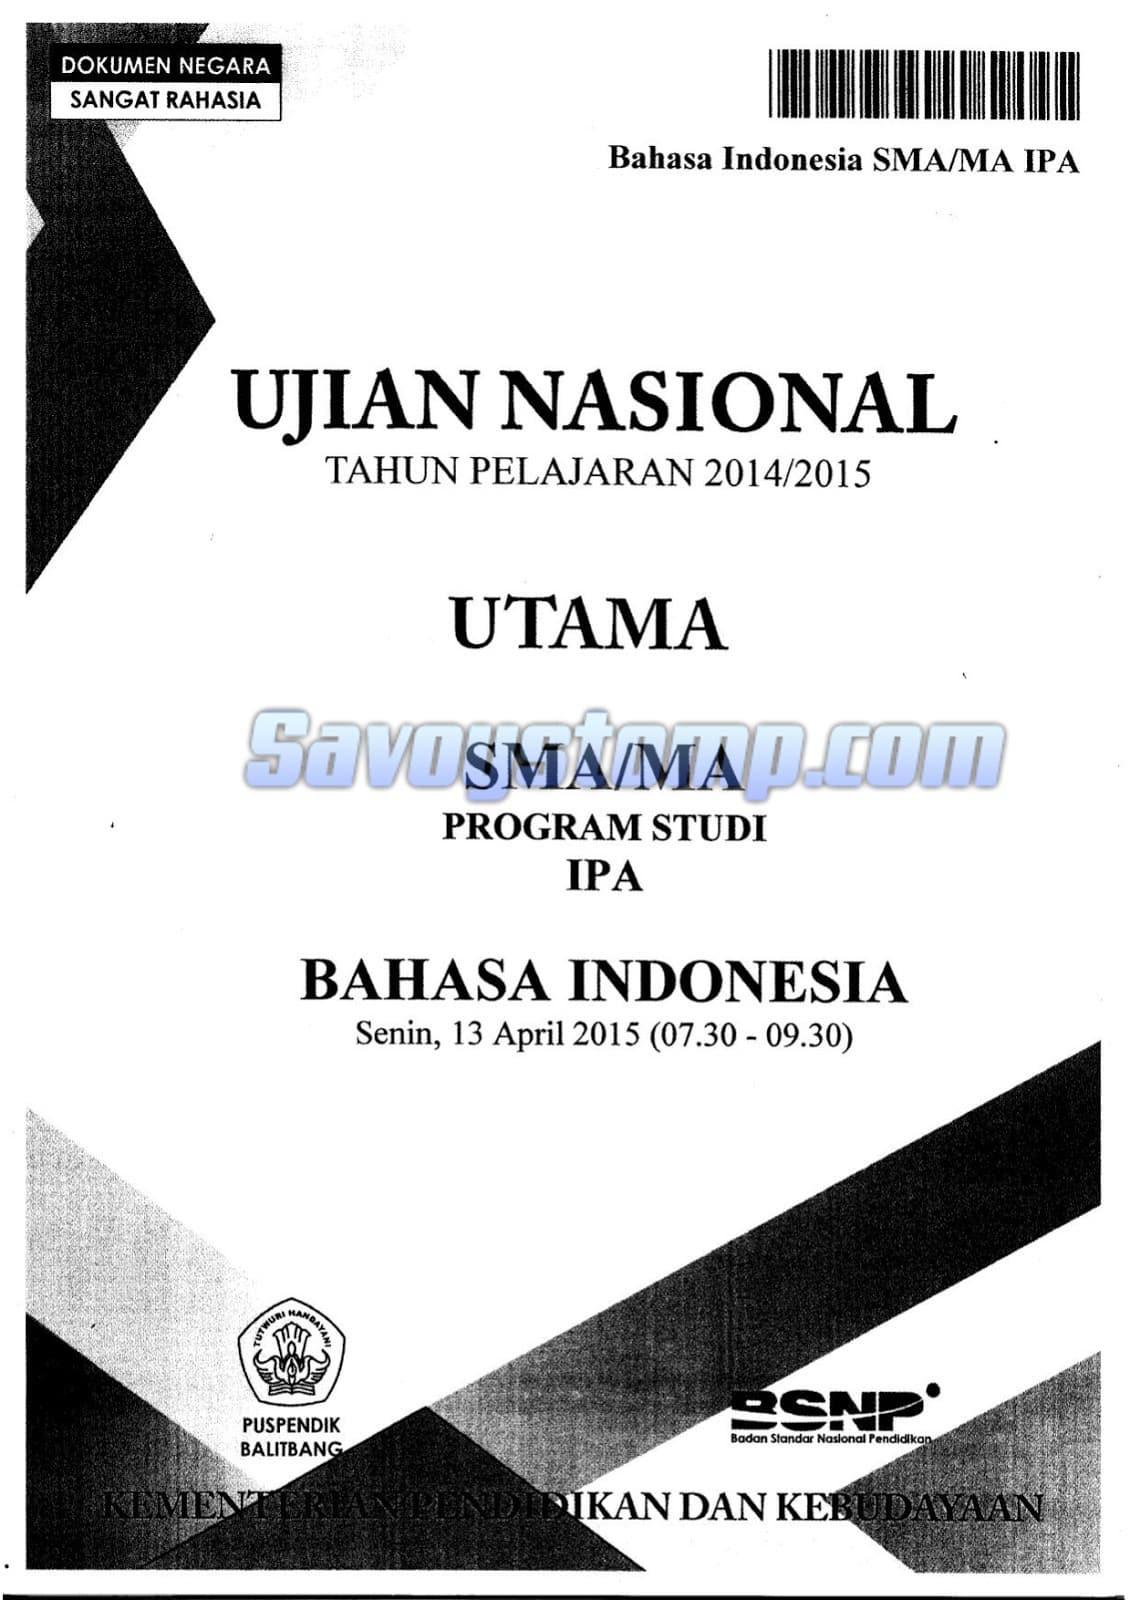 Contoh-Soal-UN-Bahasa-Indonesia-SMA-beserta-Pembahasan-Lengkap